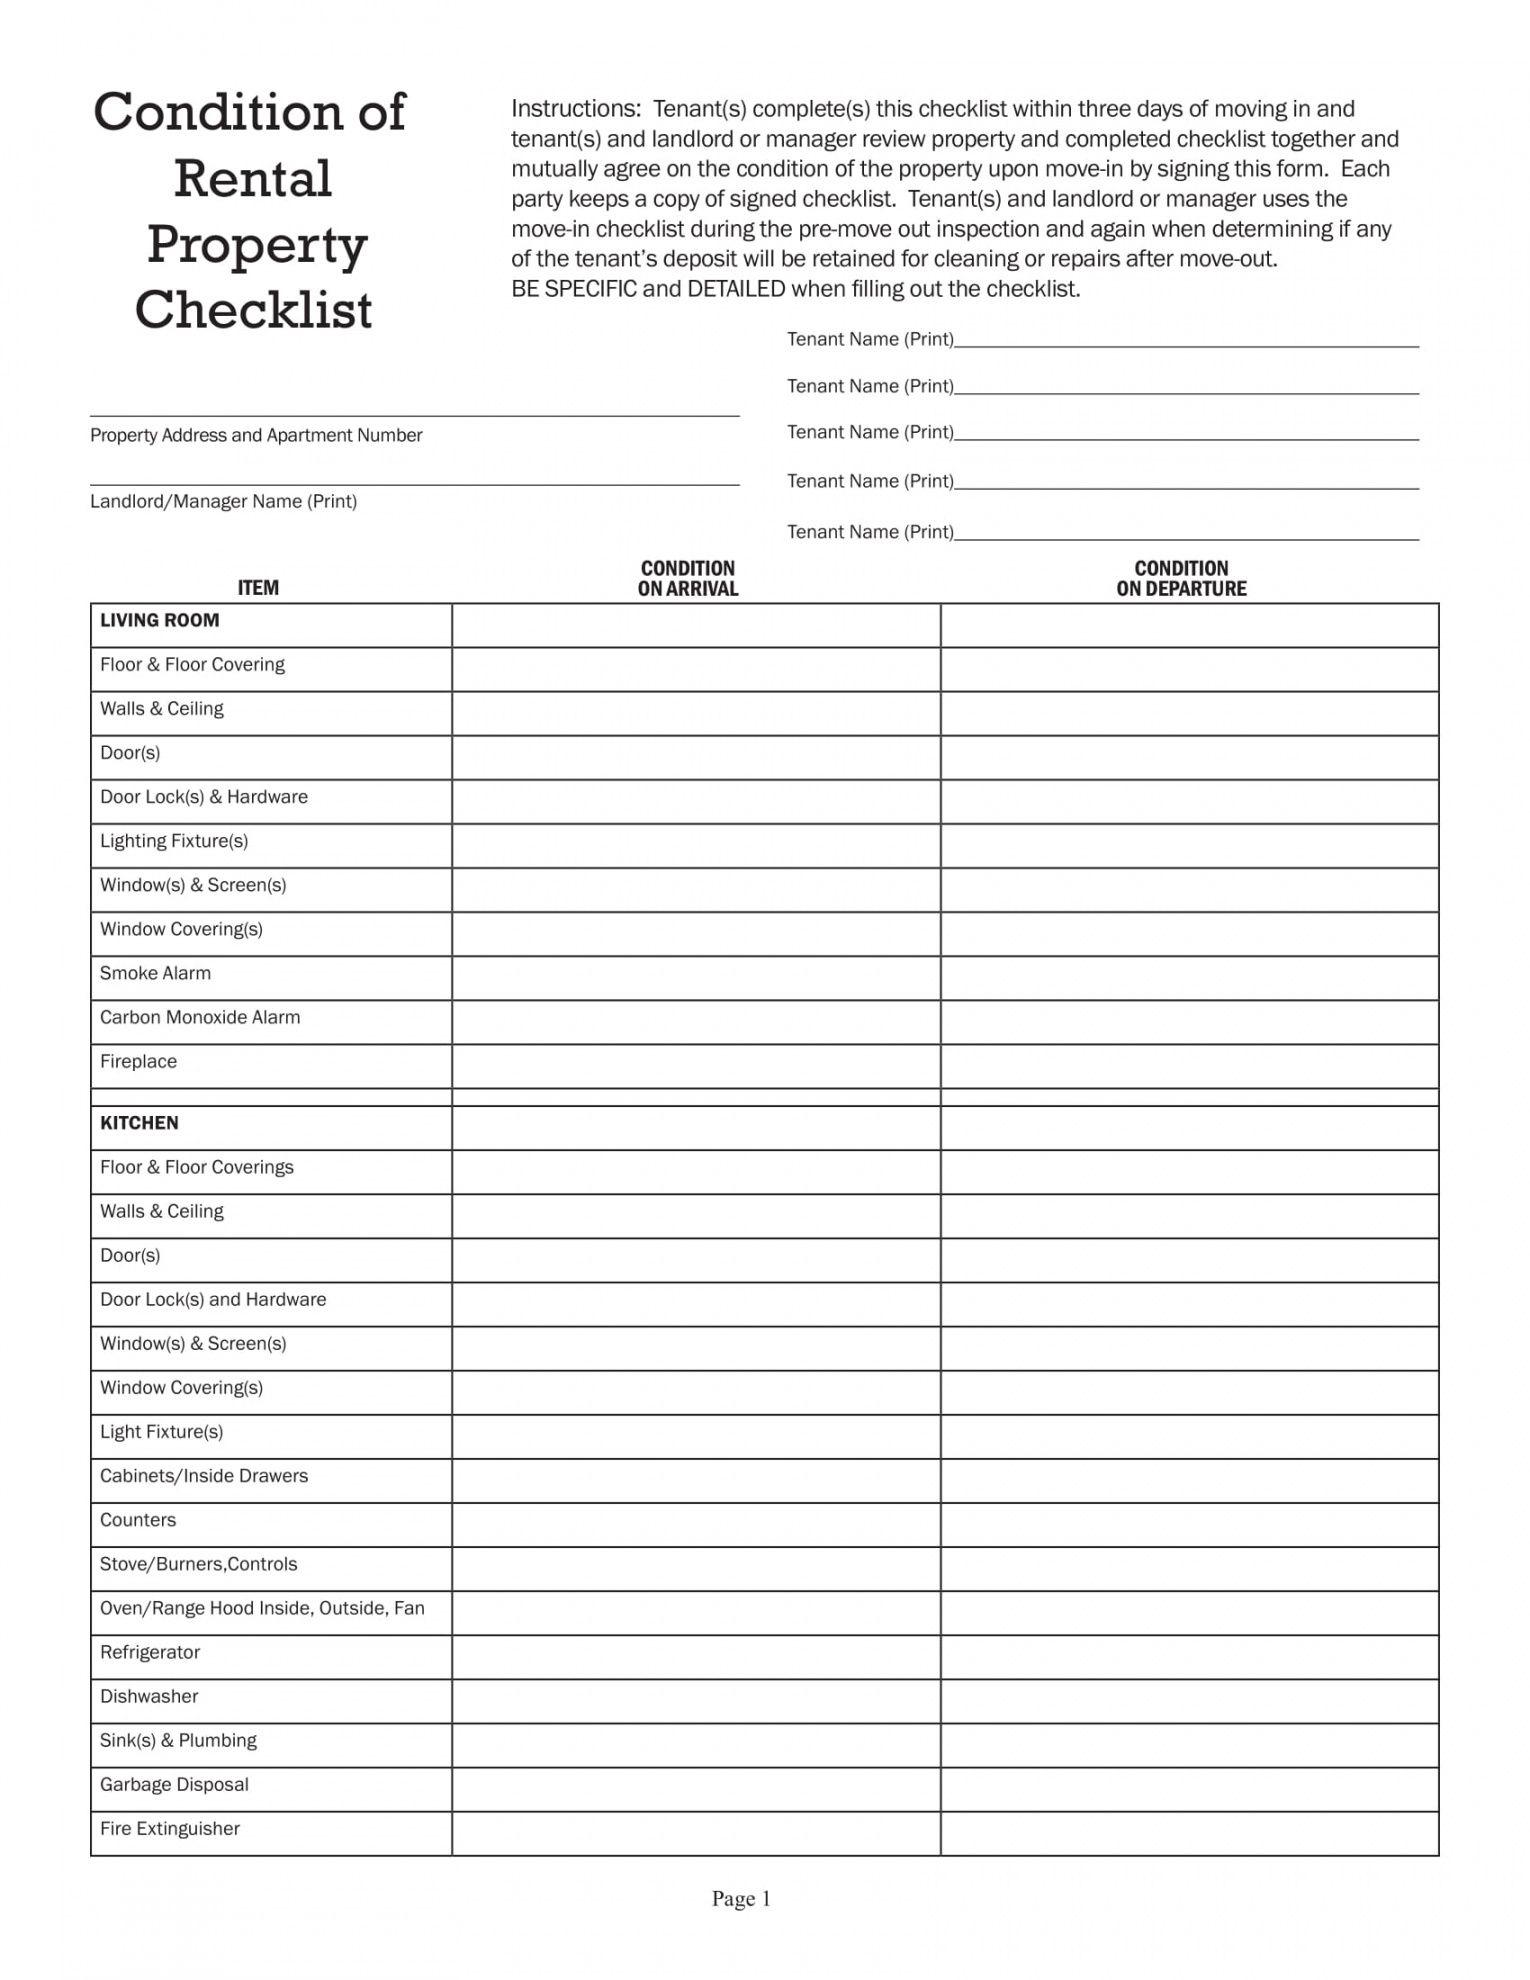 printable 10 rental checklist examples  pdf  examples rental property checklist template